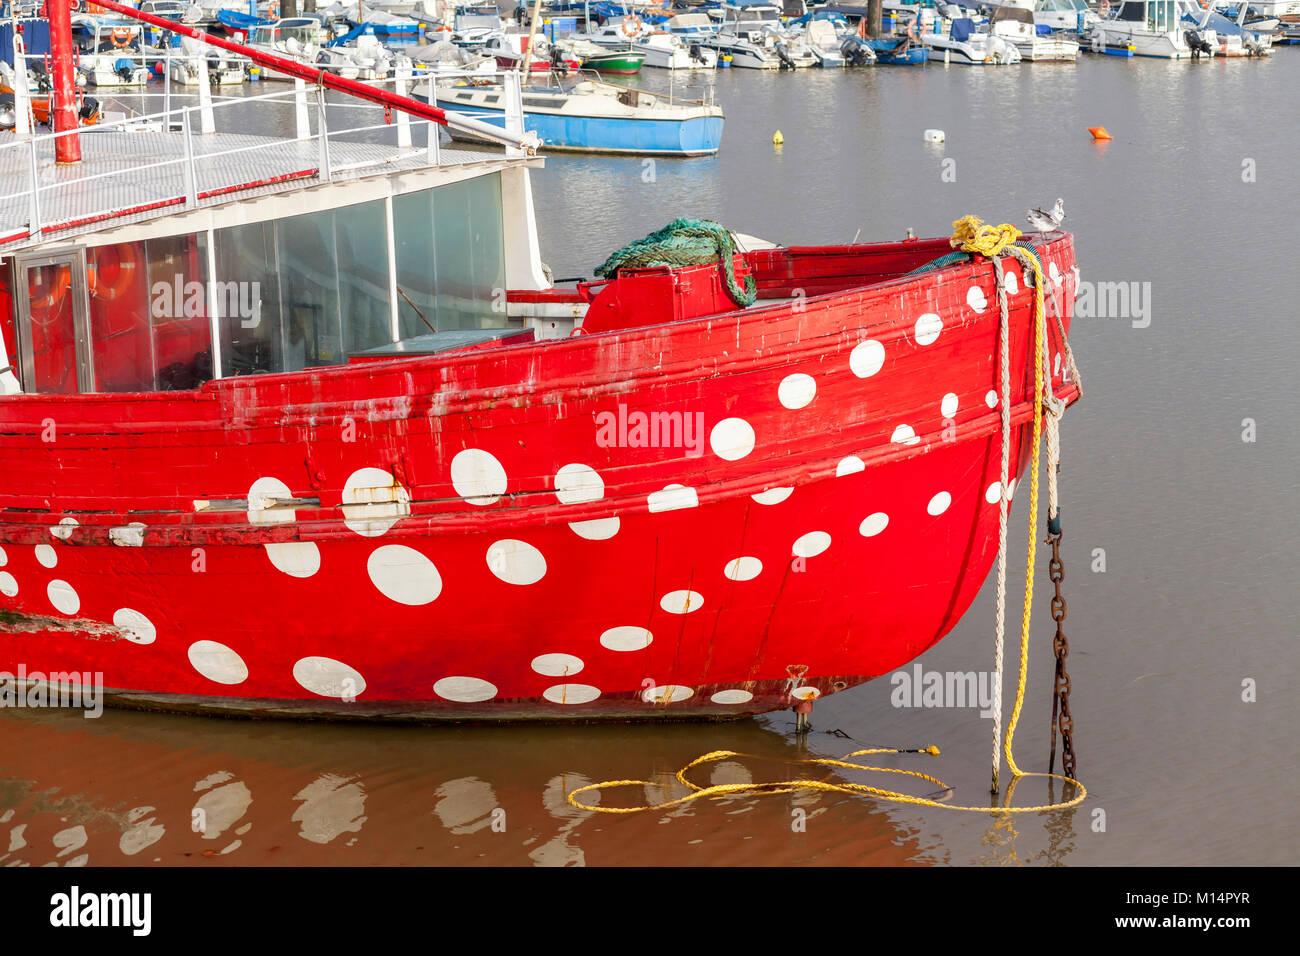 Fishing port of Santurtzi,Basque Country,Spain. - Stock Image